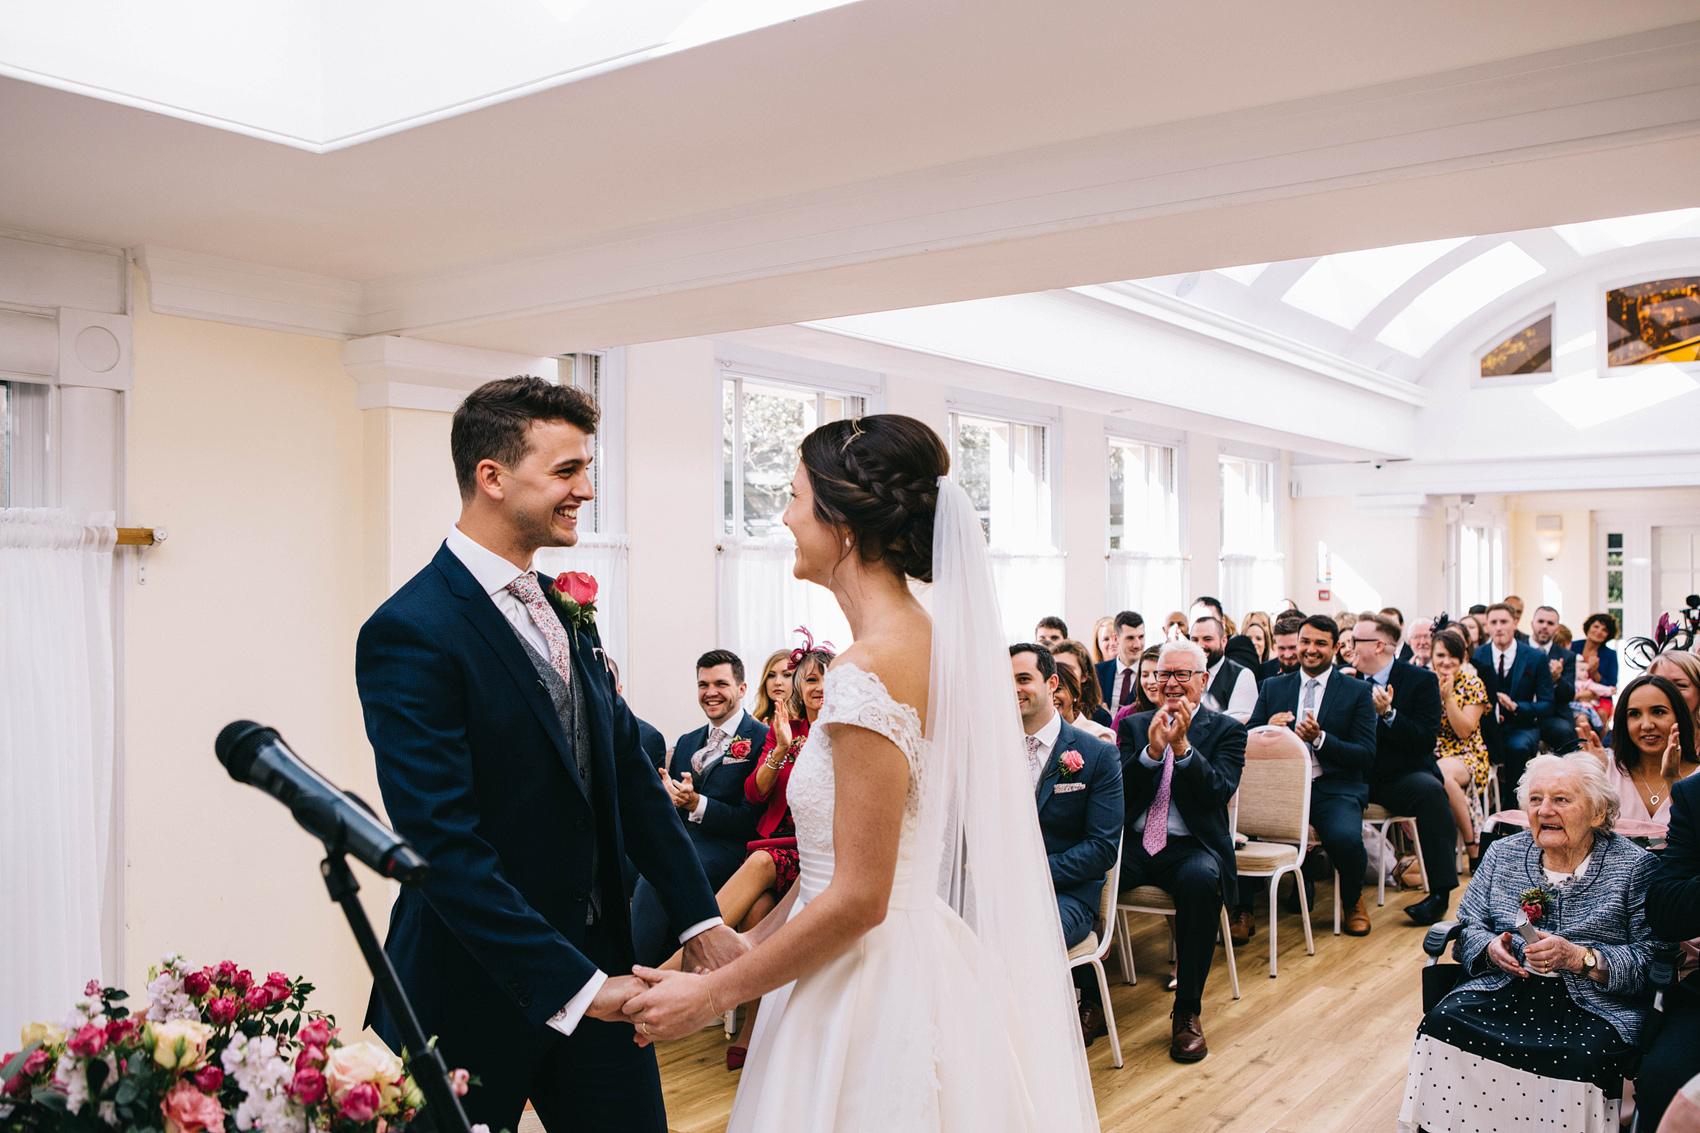 Claire_Basiuk_Richmond_Park,_London_Wedding_Photography_-3.jpg